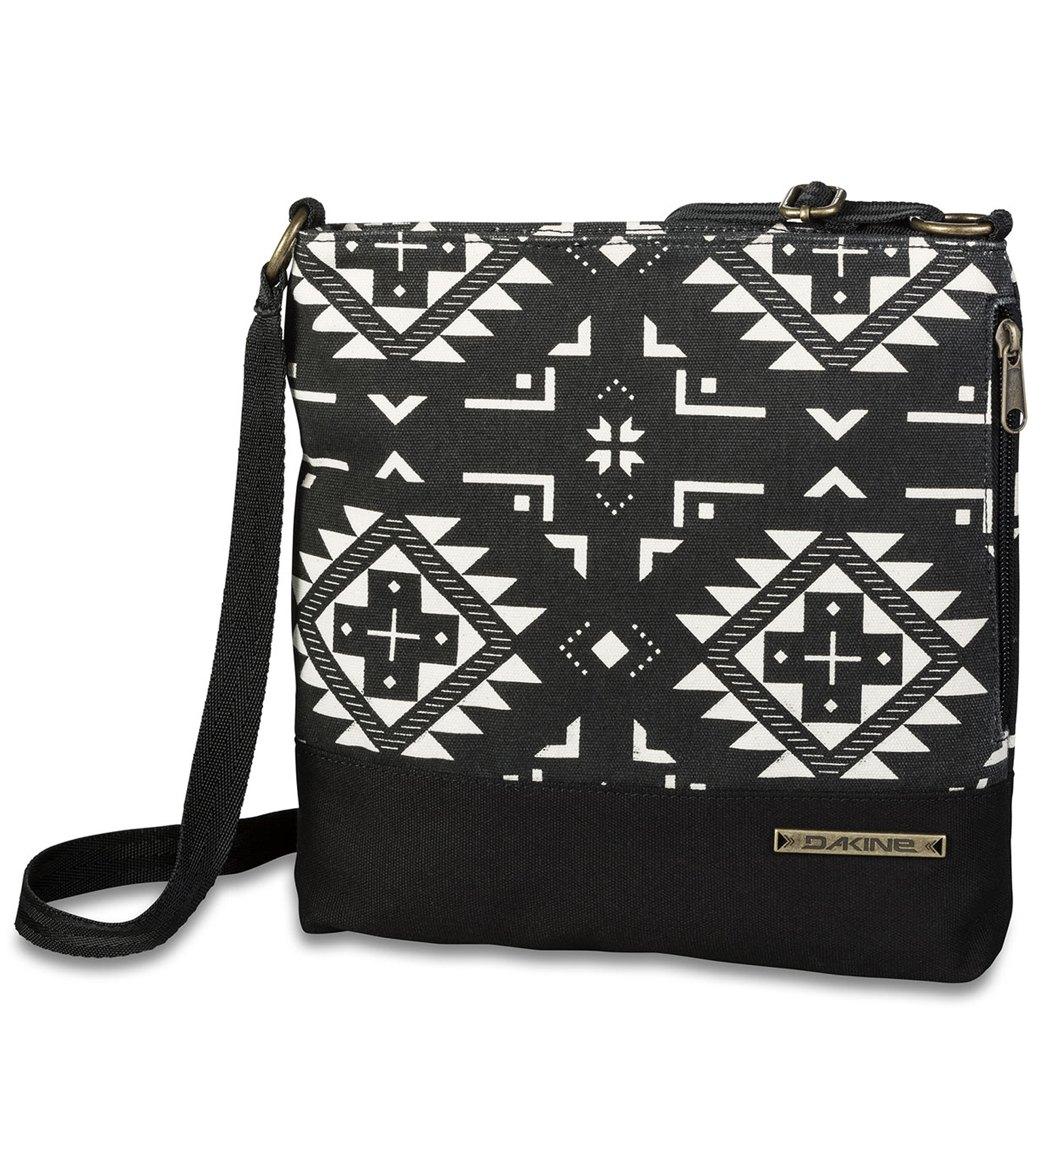 Dakine Women s Jodie Handbag at SwimOutlet.com e313691246245